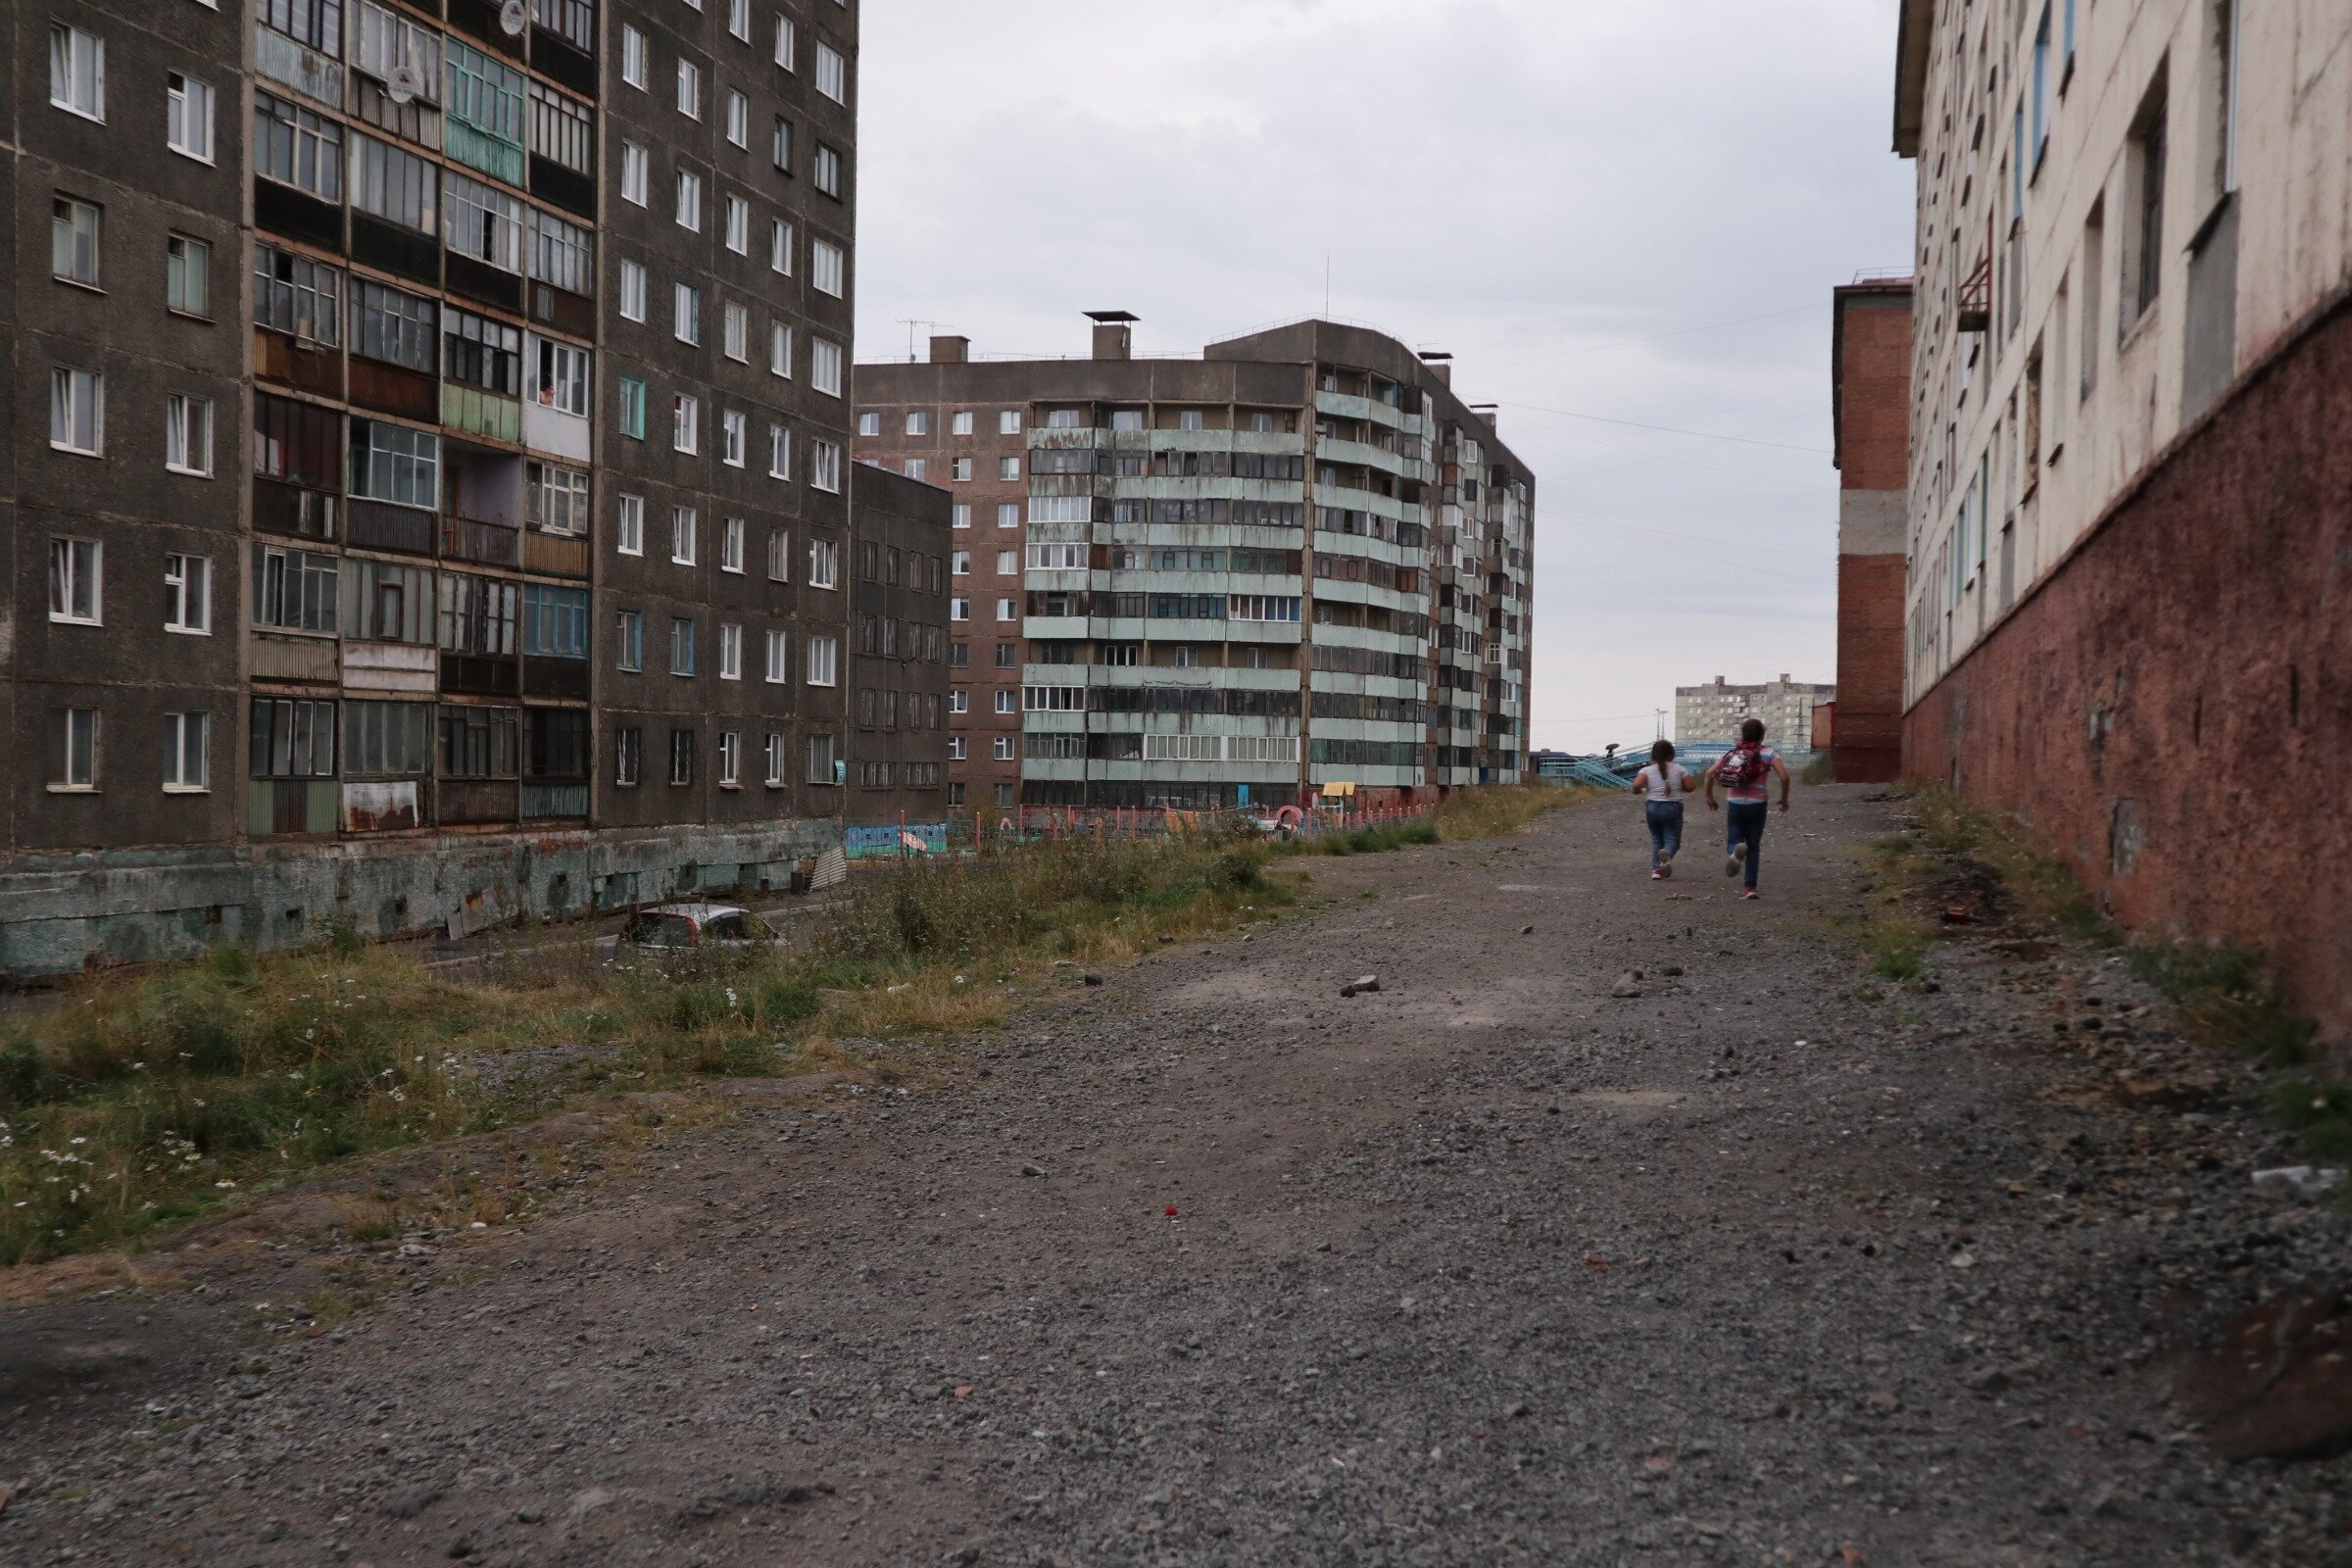 Norisk: the City of Hopelessness